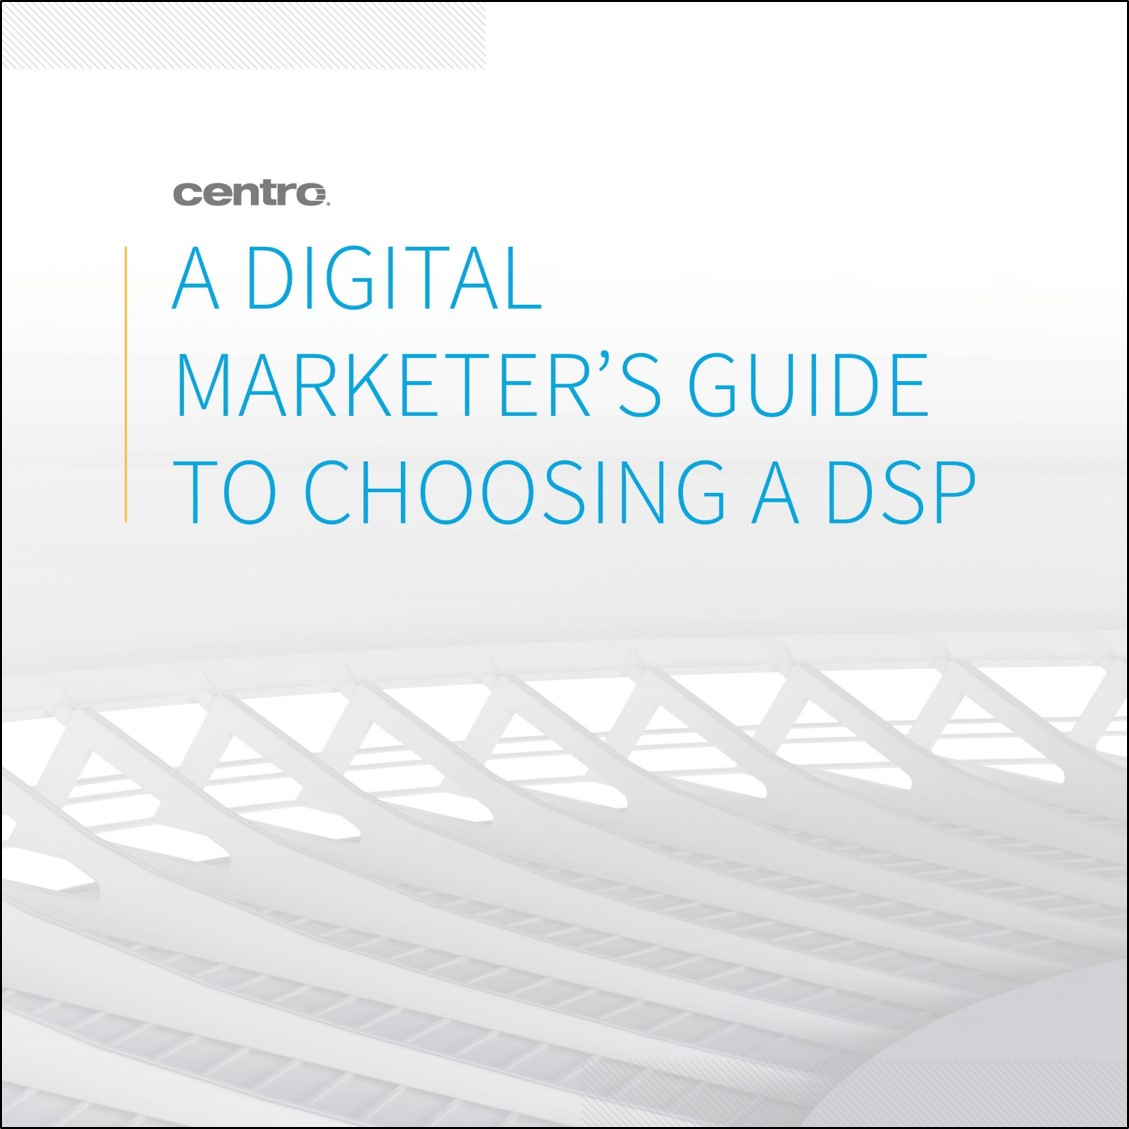 Choosing A DSP